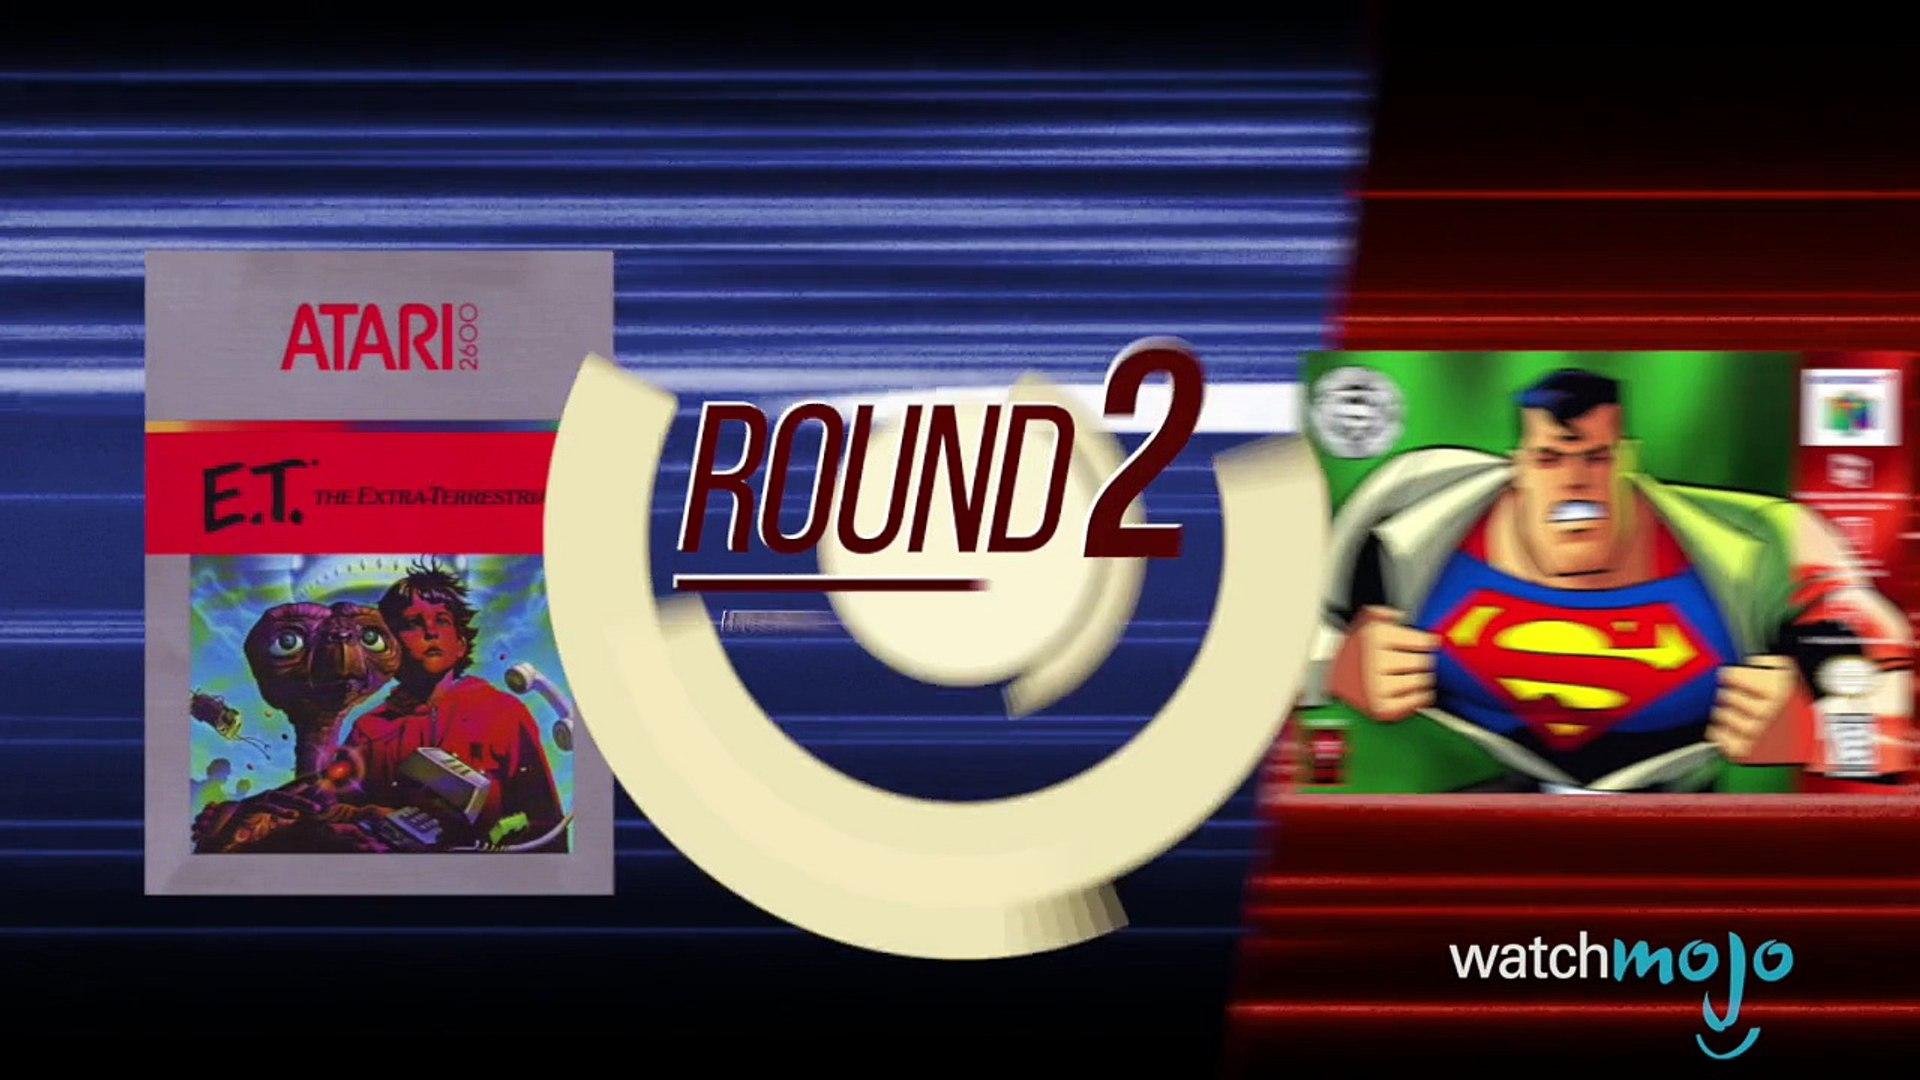 Superman 64 VS E.T. Atari: Battle for the Worst Game Ever